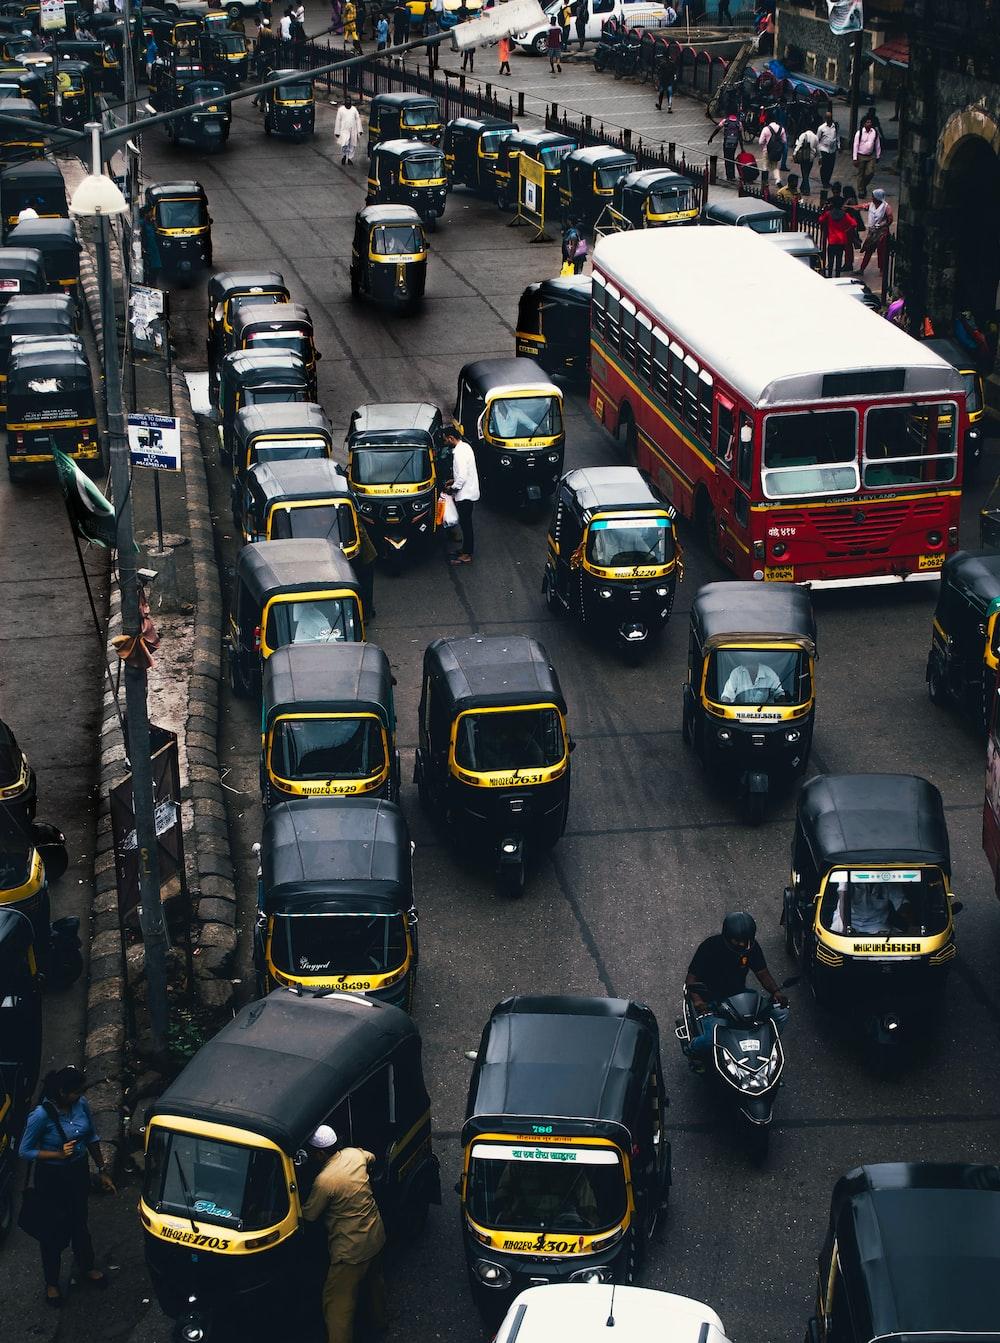 black-and-yellow auto rickshaw on road